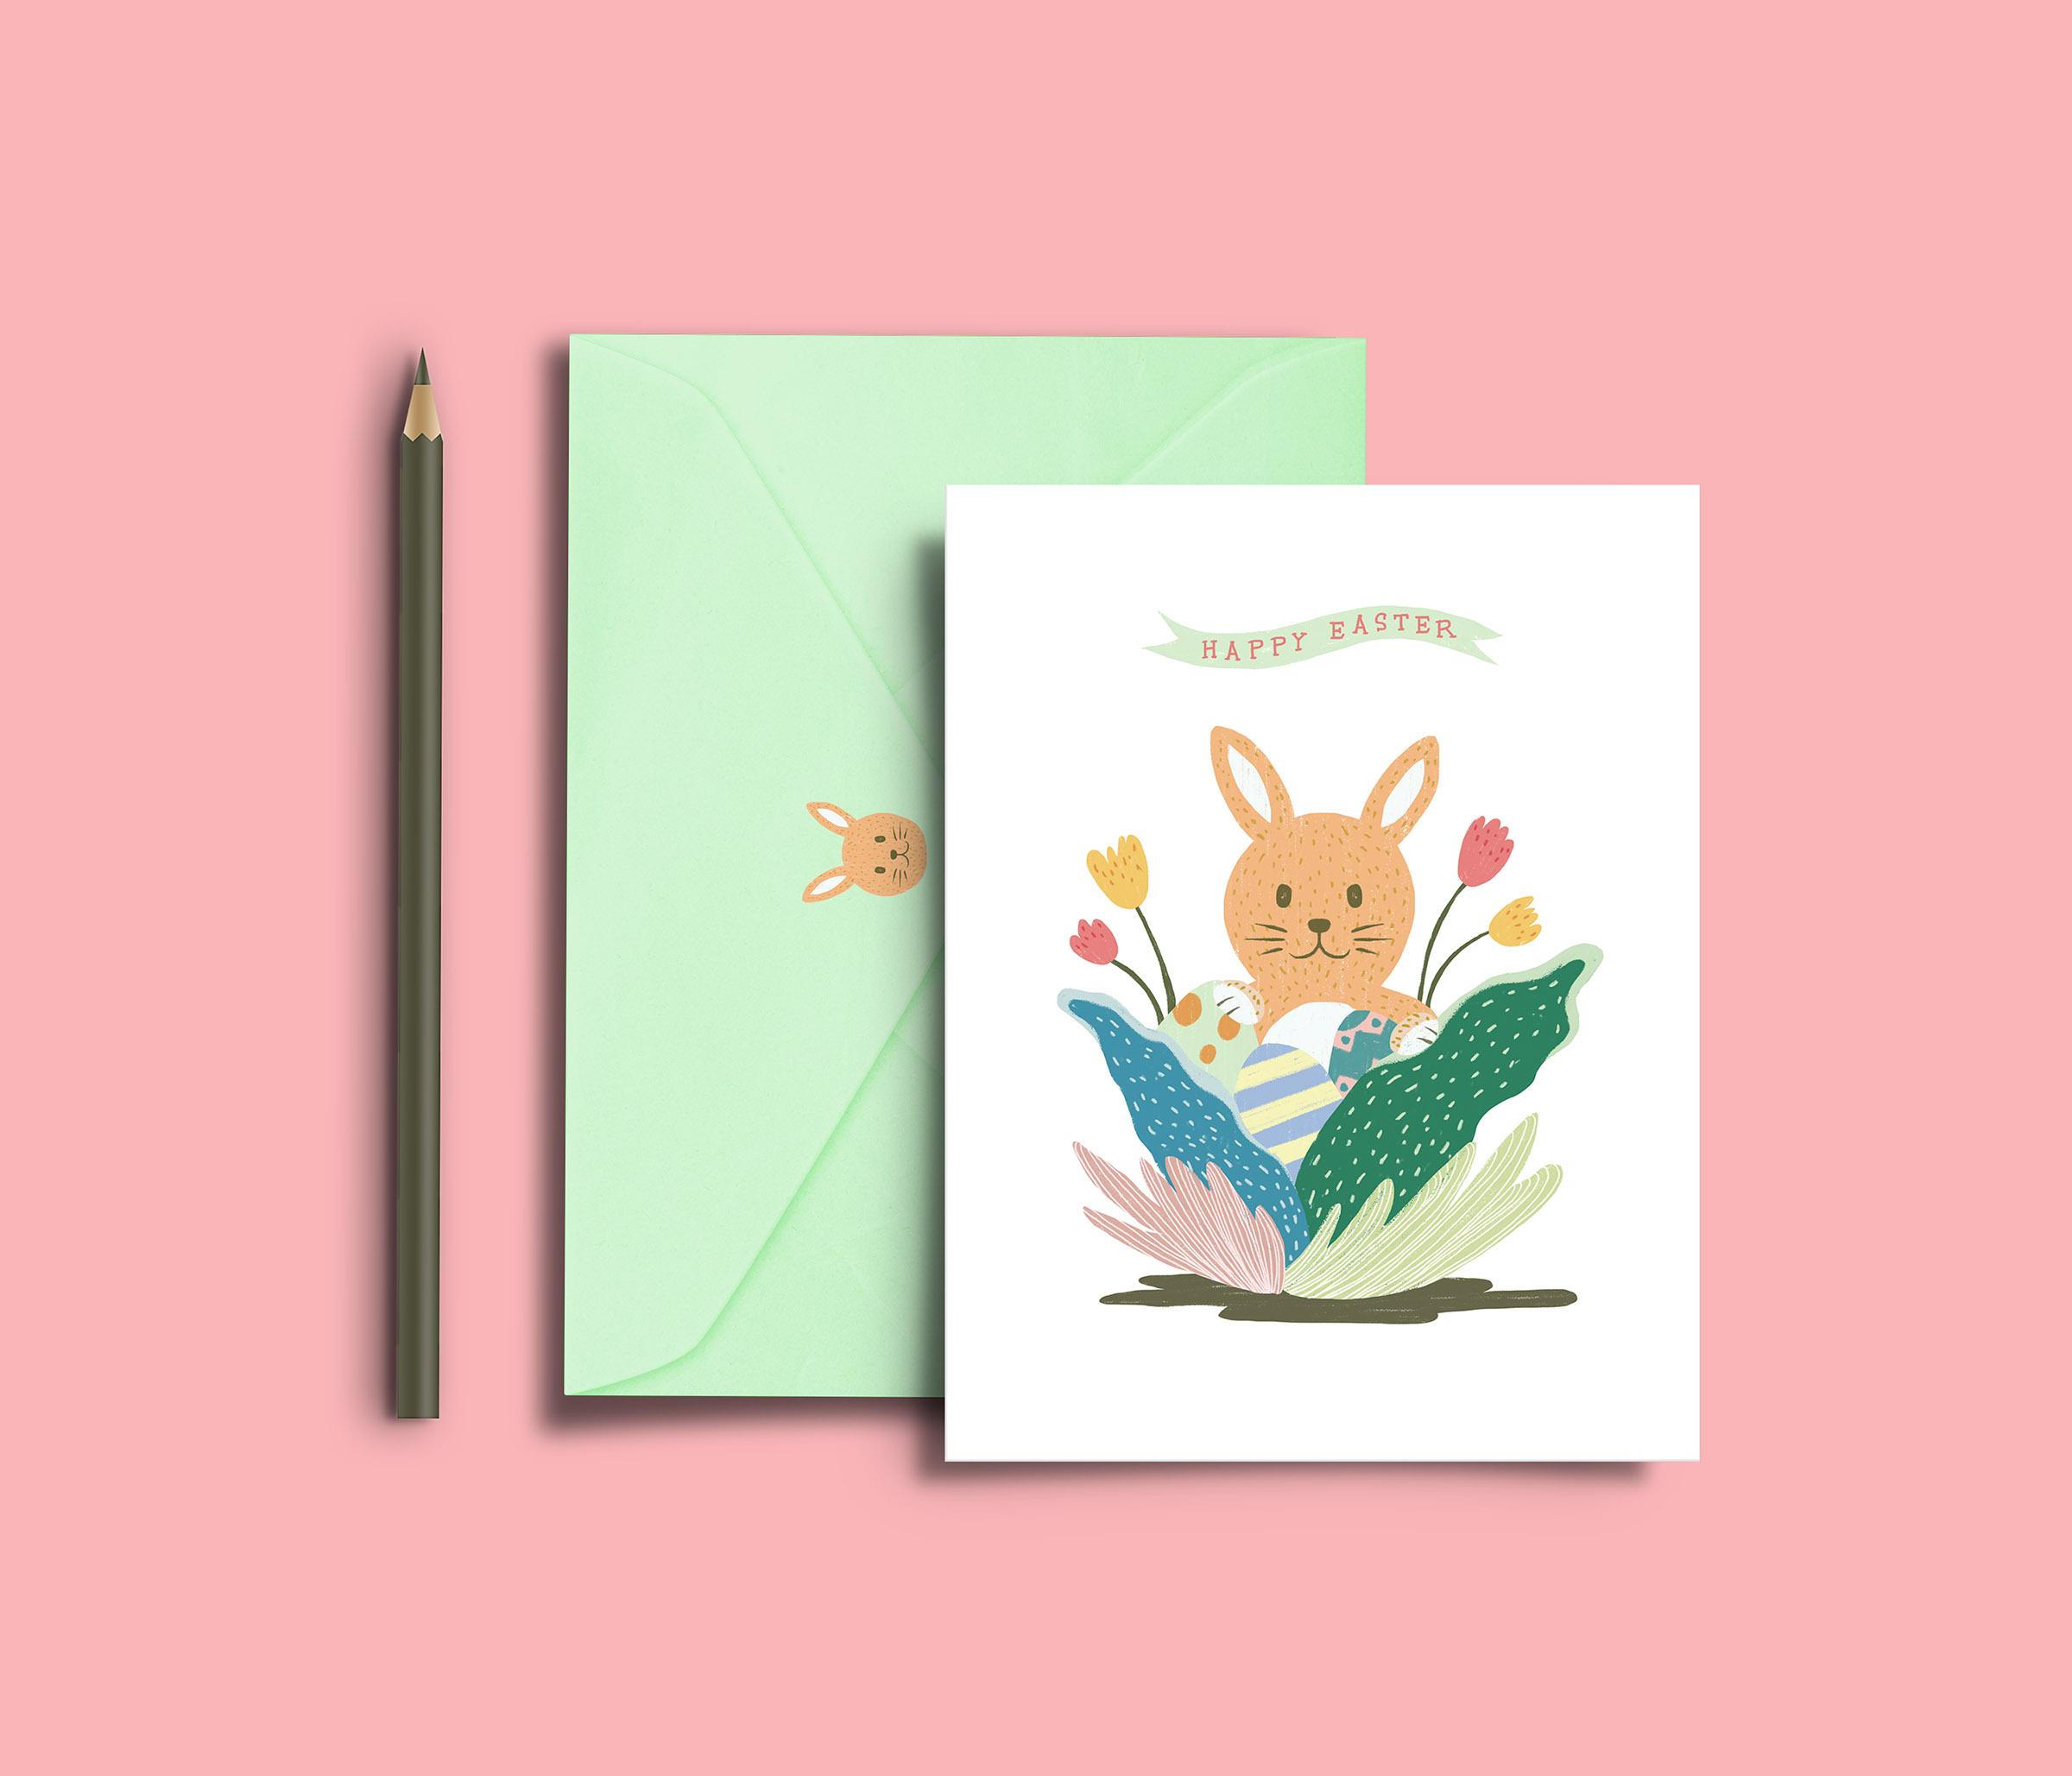 MINI-SYS.COM Shirley Susilo Greeting Card easter.jpg